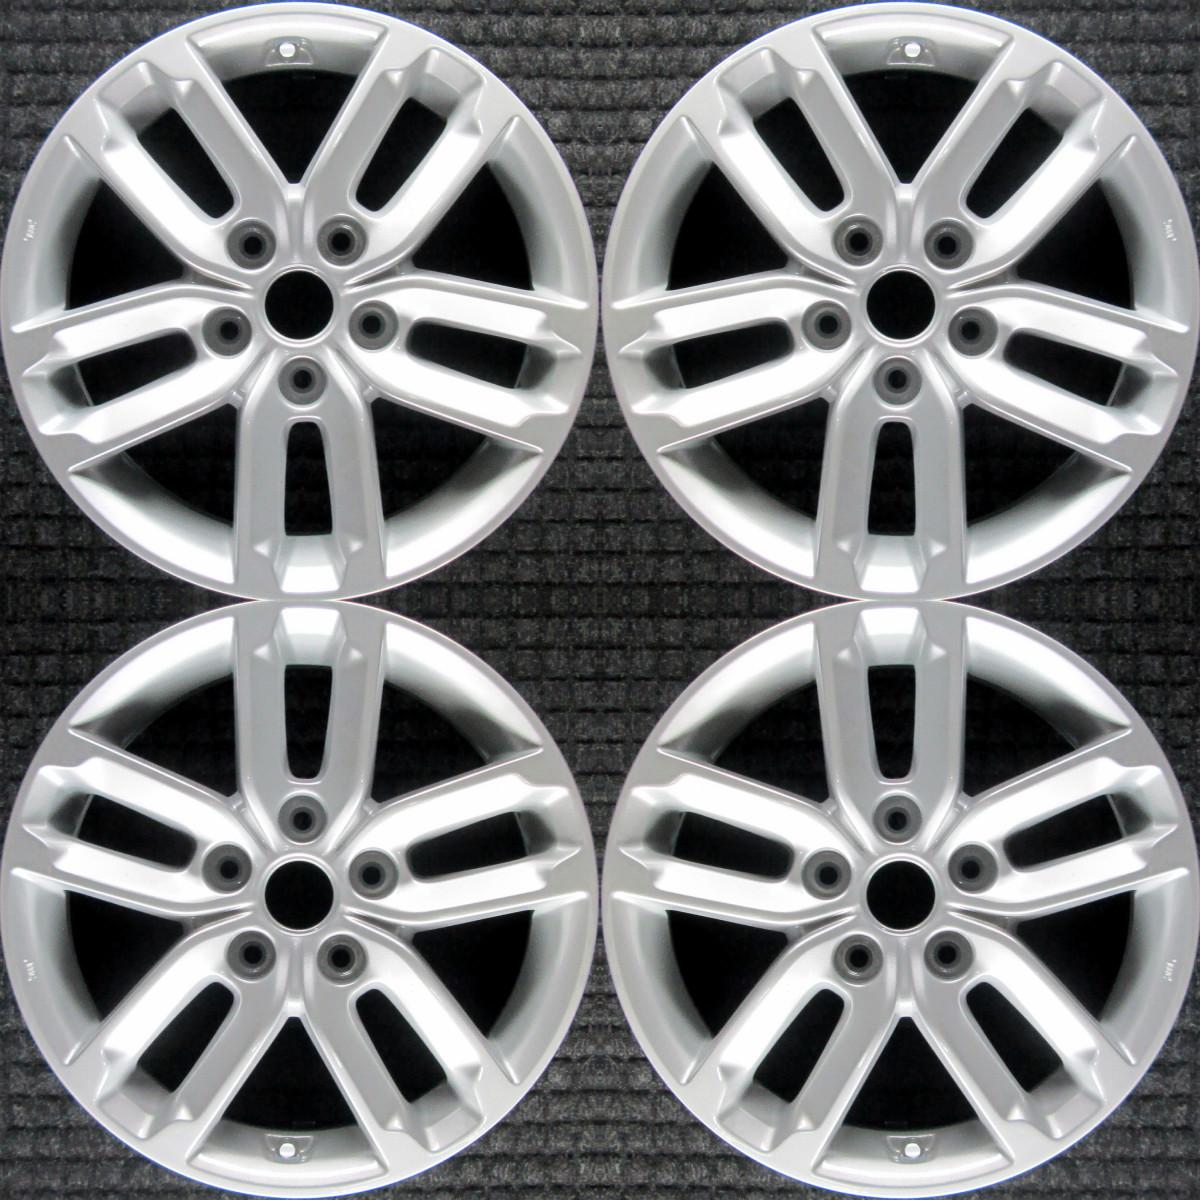 OEM Kia Optima 16 inch Wheel 52910-2G730